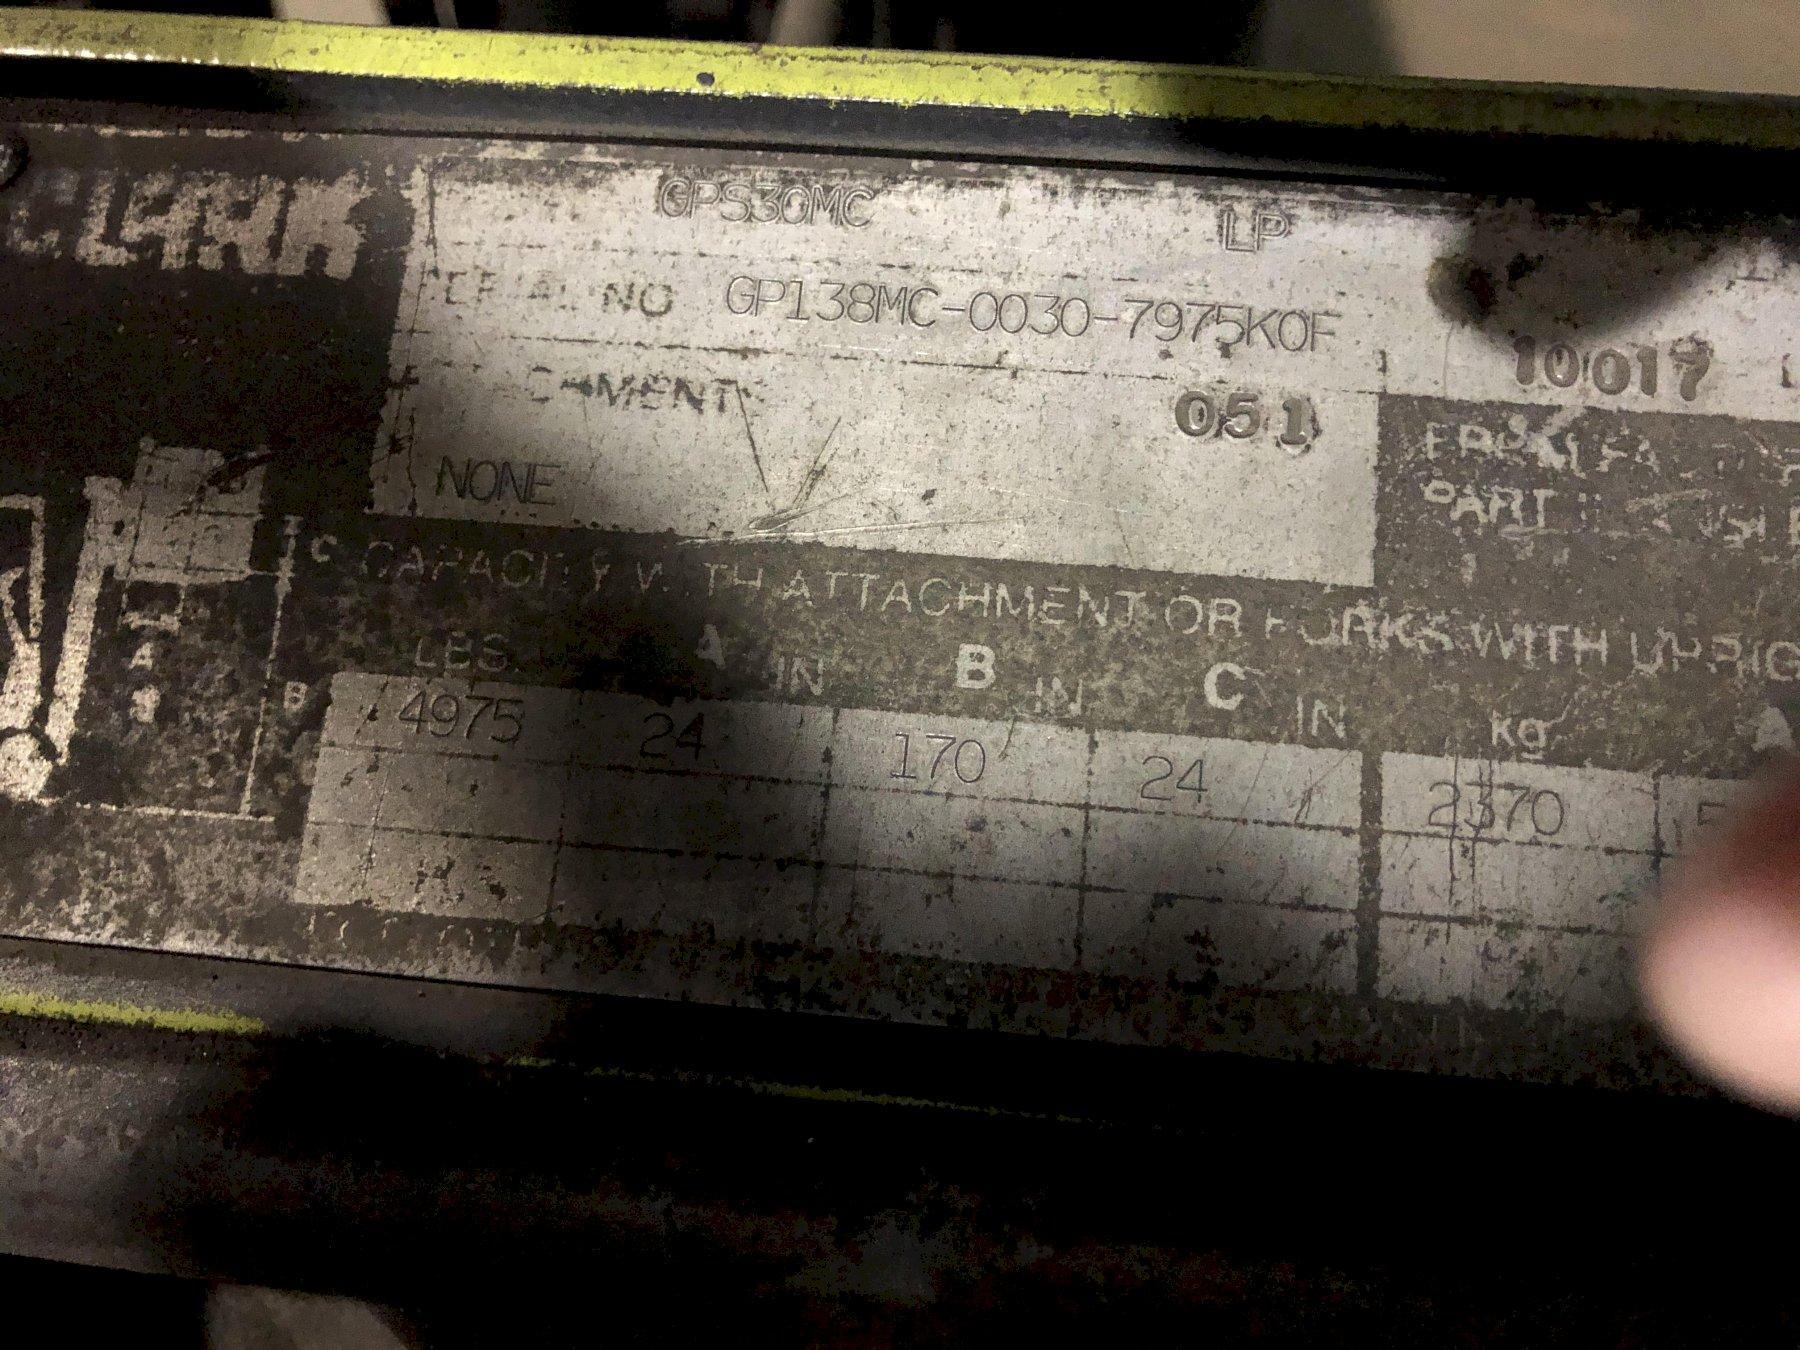 "Clark model gps 30mc 4975# l/p powered fork lift truck s/n gp138mc-0030-7975kof, 170"" lift, late delivery"